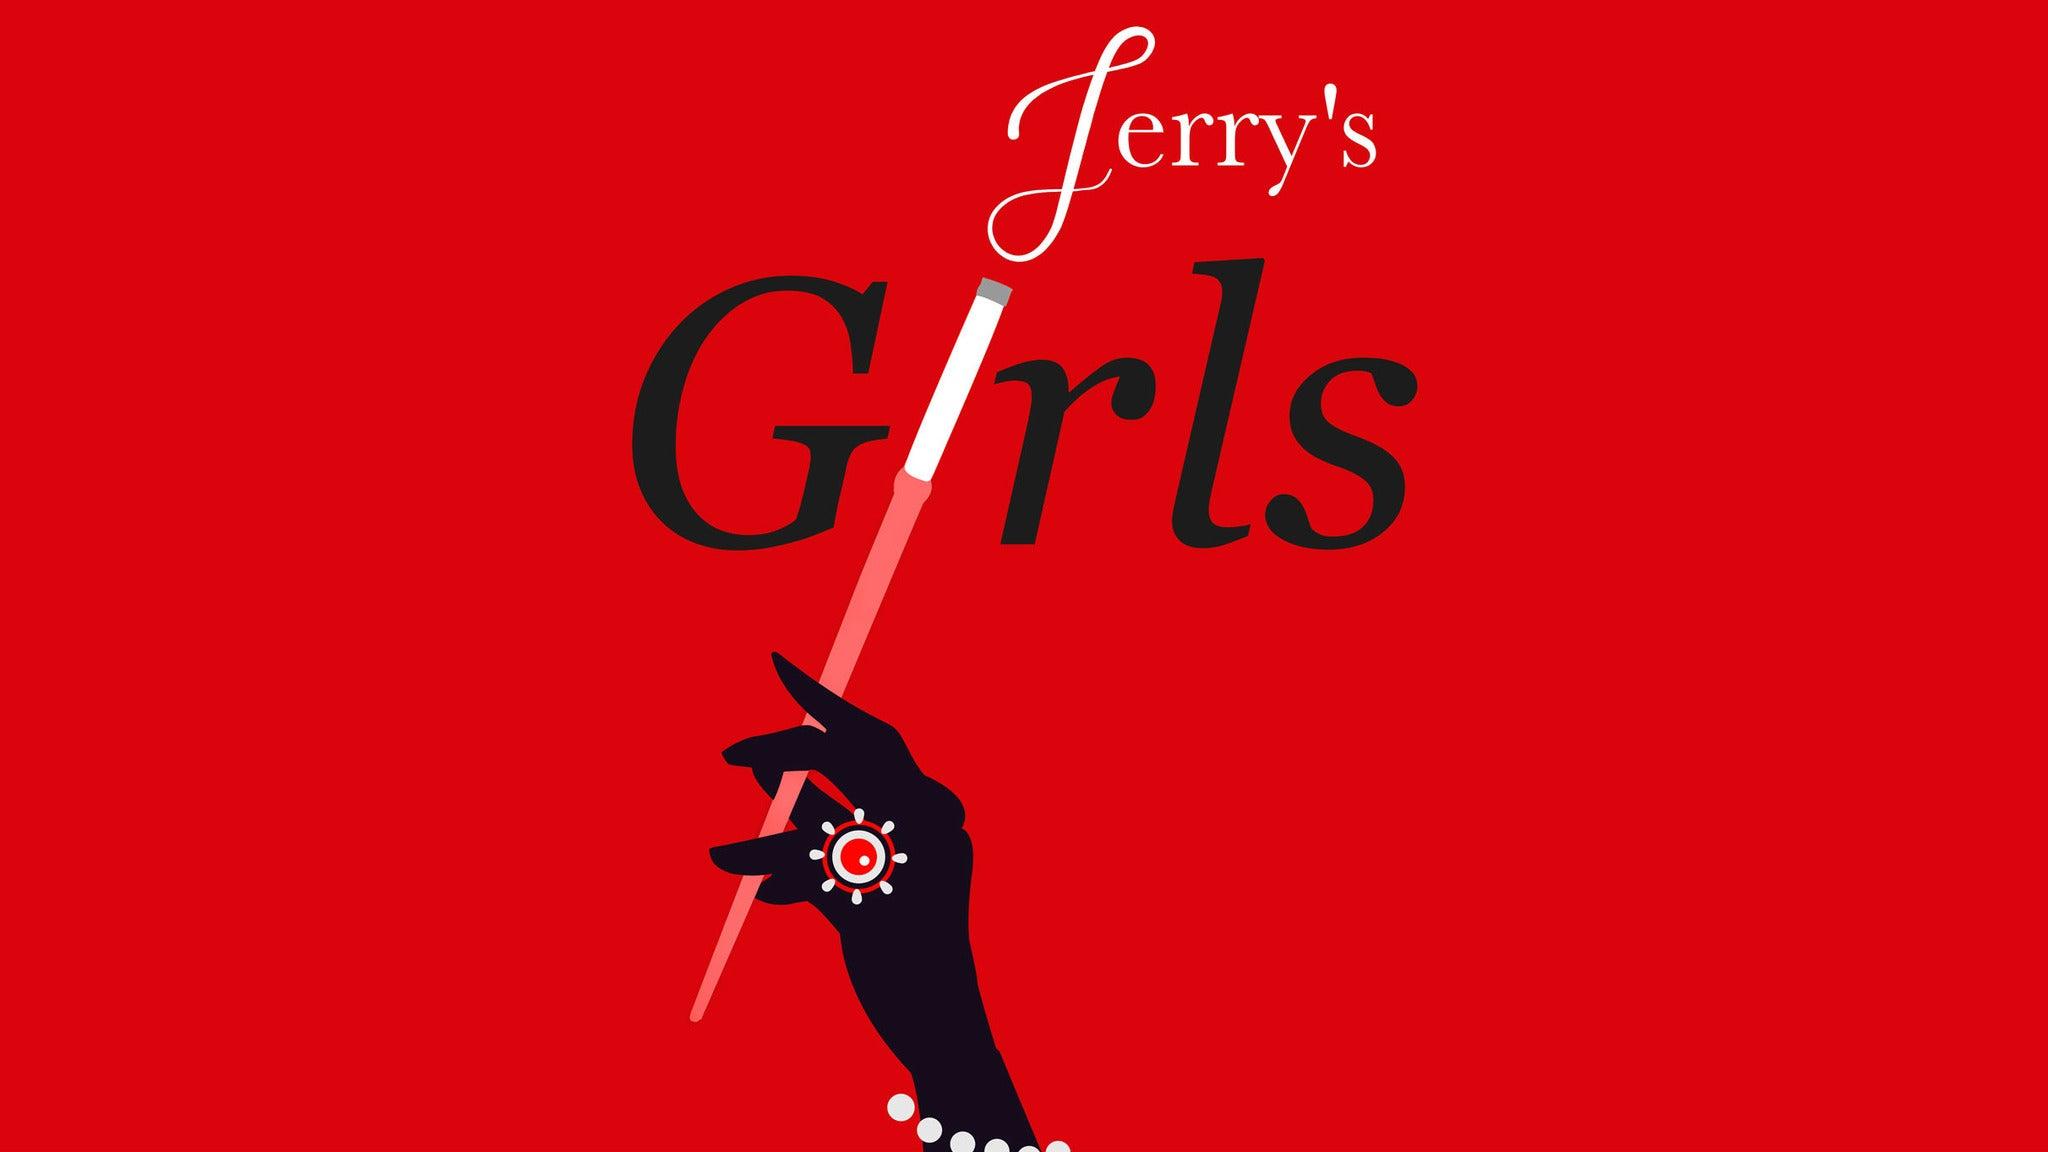 Walnut Street Theatre's Jerry's Girls